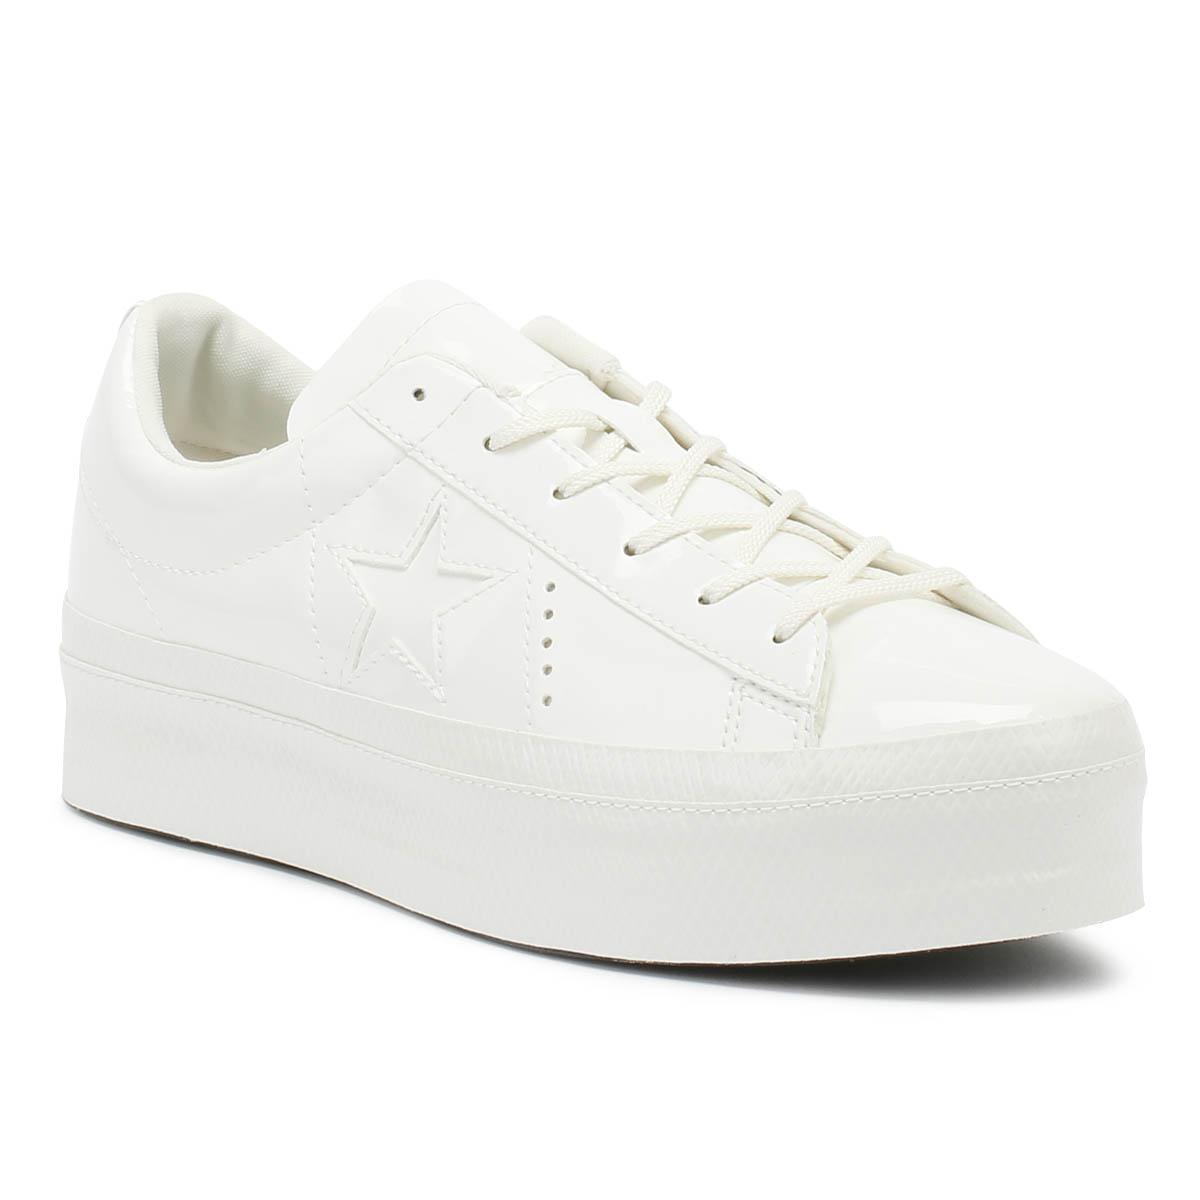 800928d6efc Lyst - Converse One Star Womens Vintage White Platform Ox Trainers ...